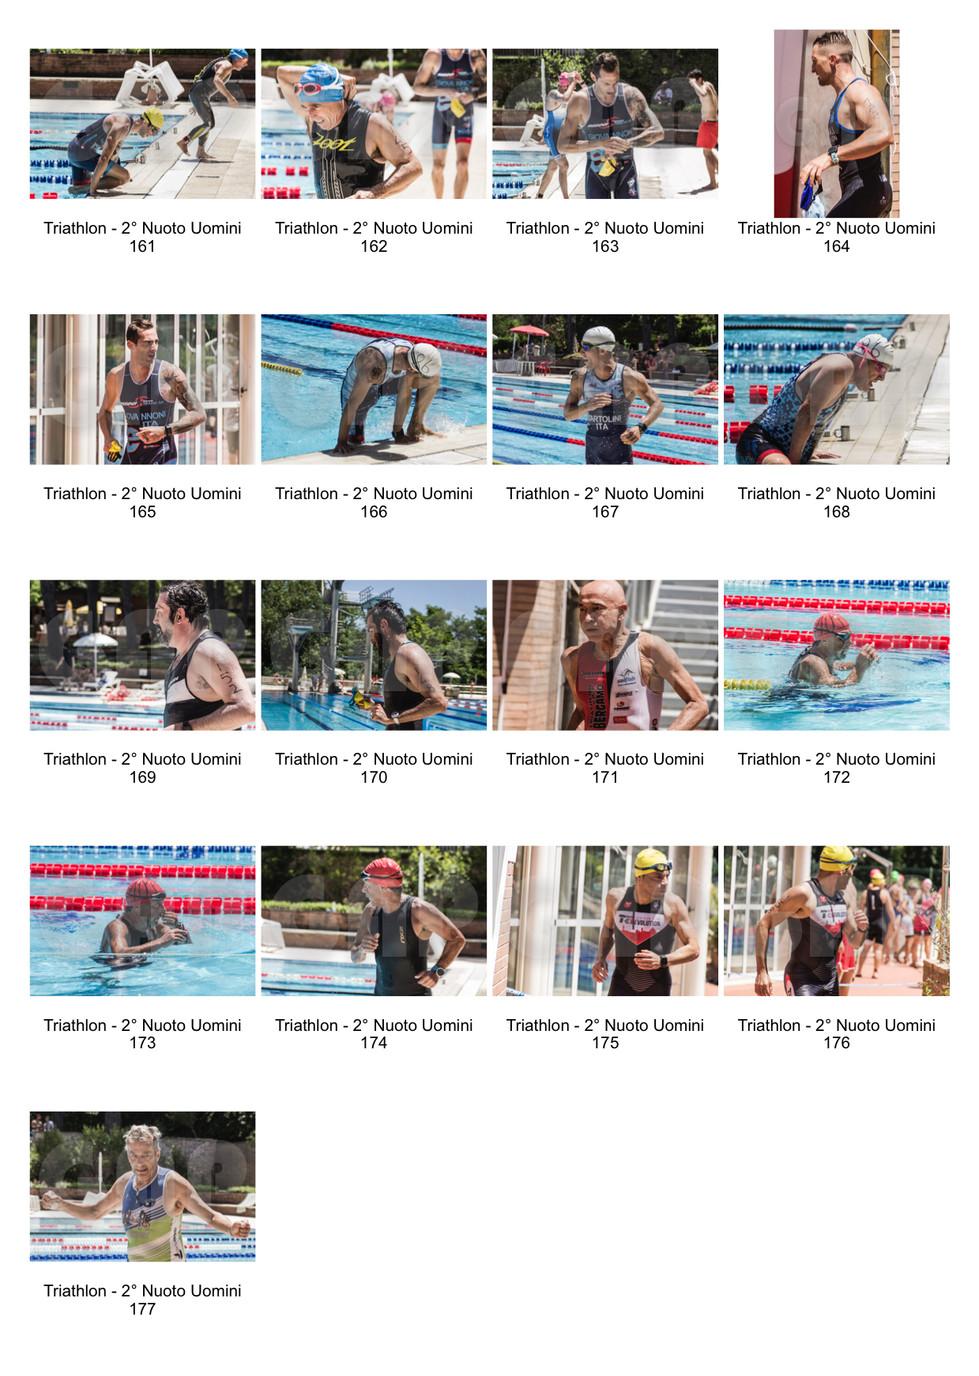 Triathlon_V.Elsa_-_2°_Frazione_Nuoto_Uomini_-9.jpg